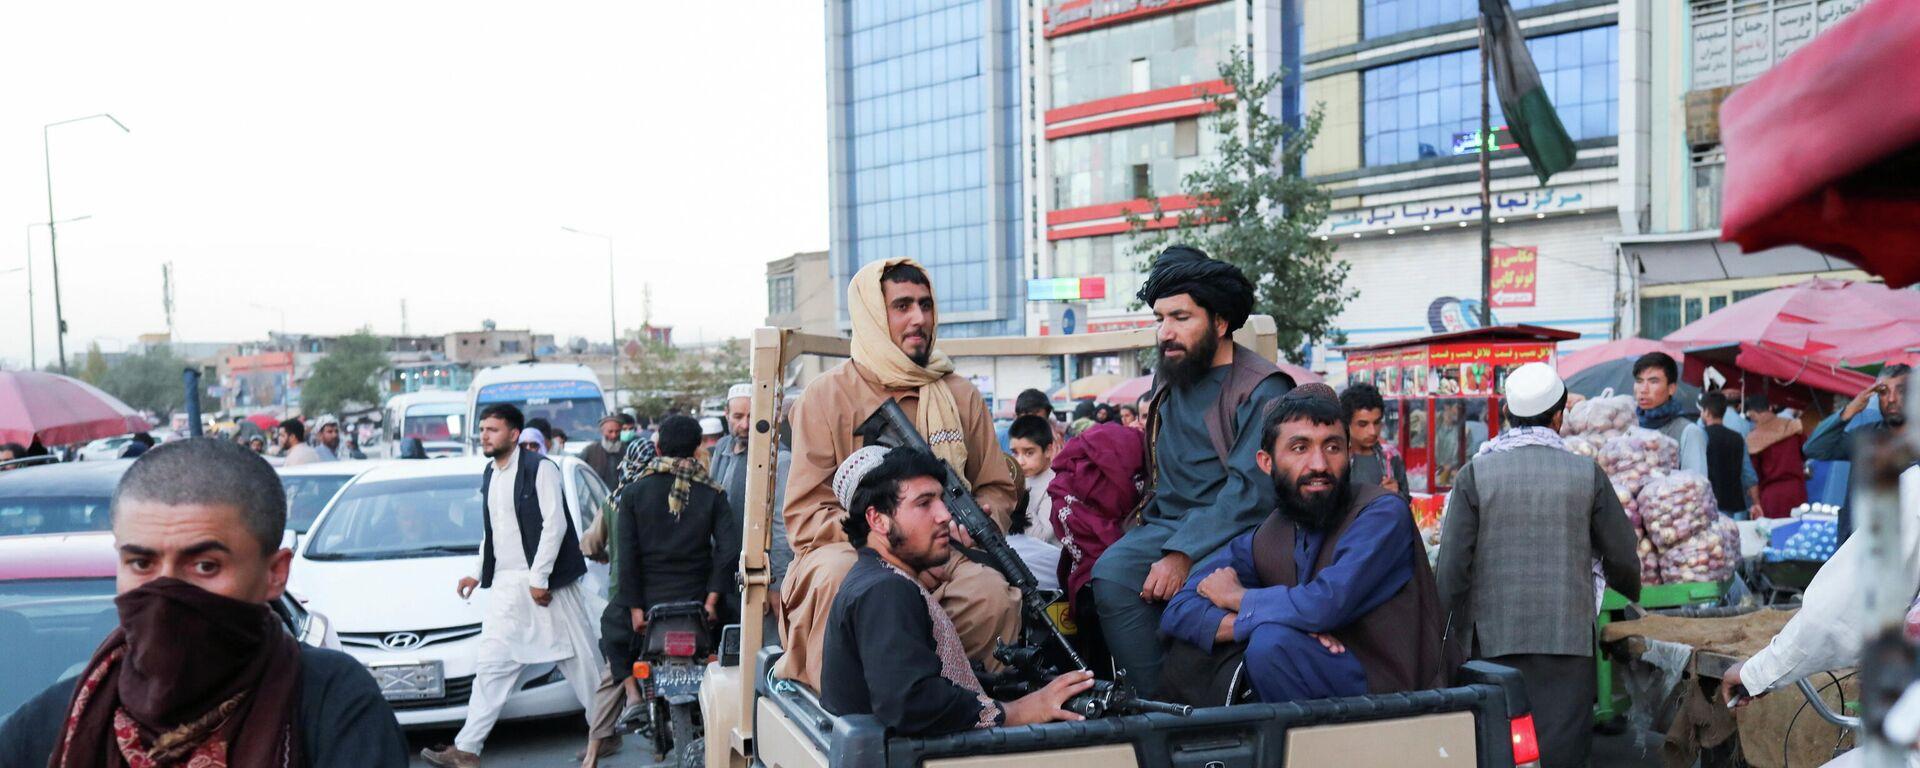 Soldados talibanes - Sputnik Mundo, 1920, 27.09.2021